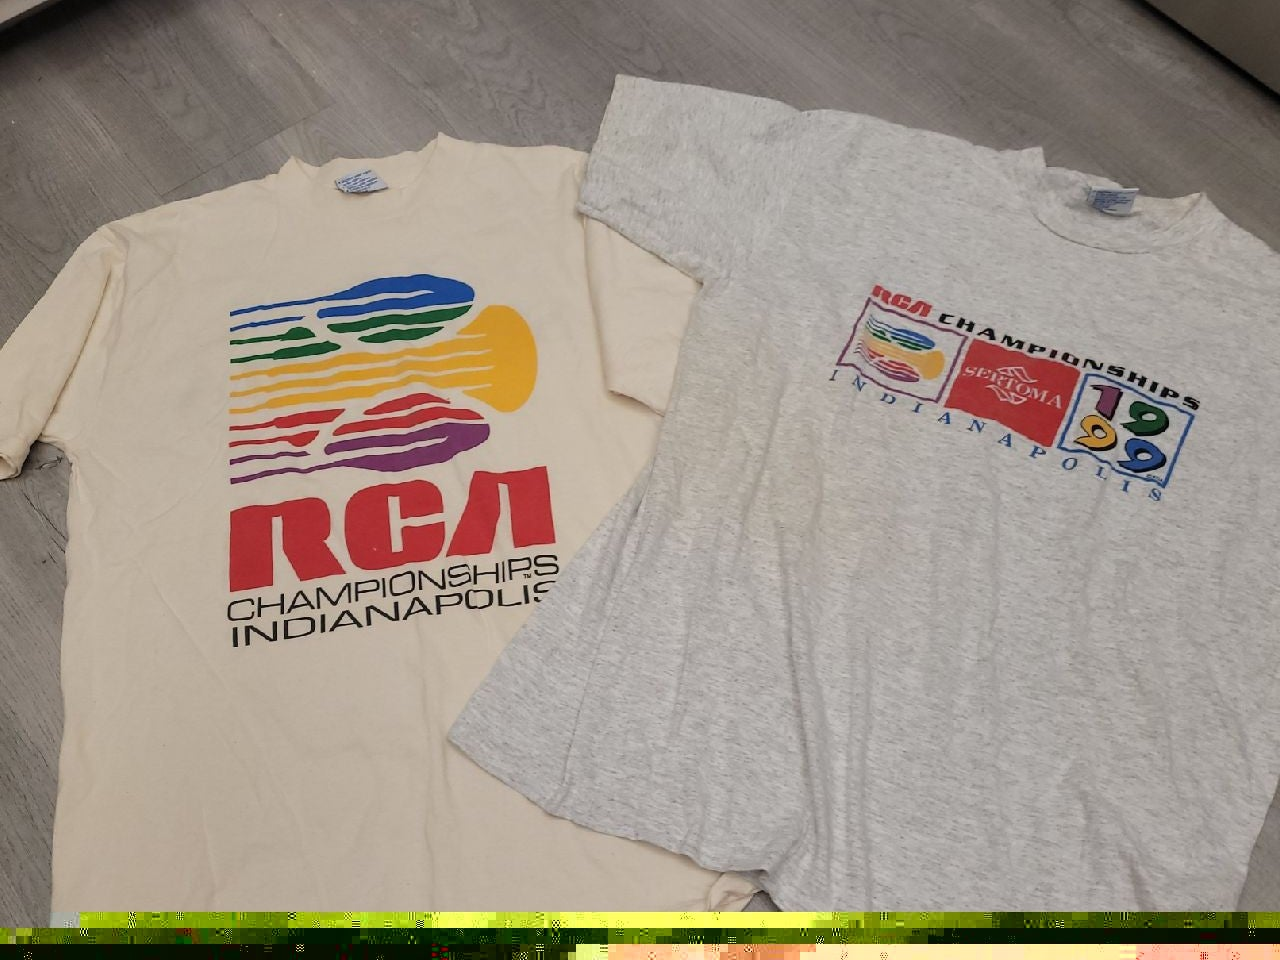 Vintage 1999 Indianapolis tennis t-shirt